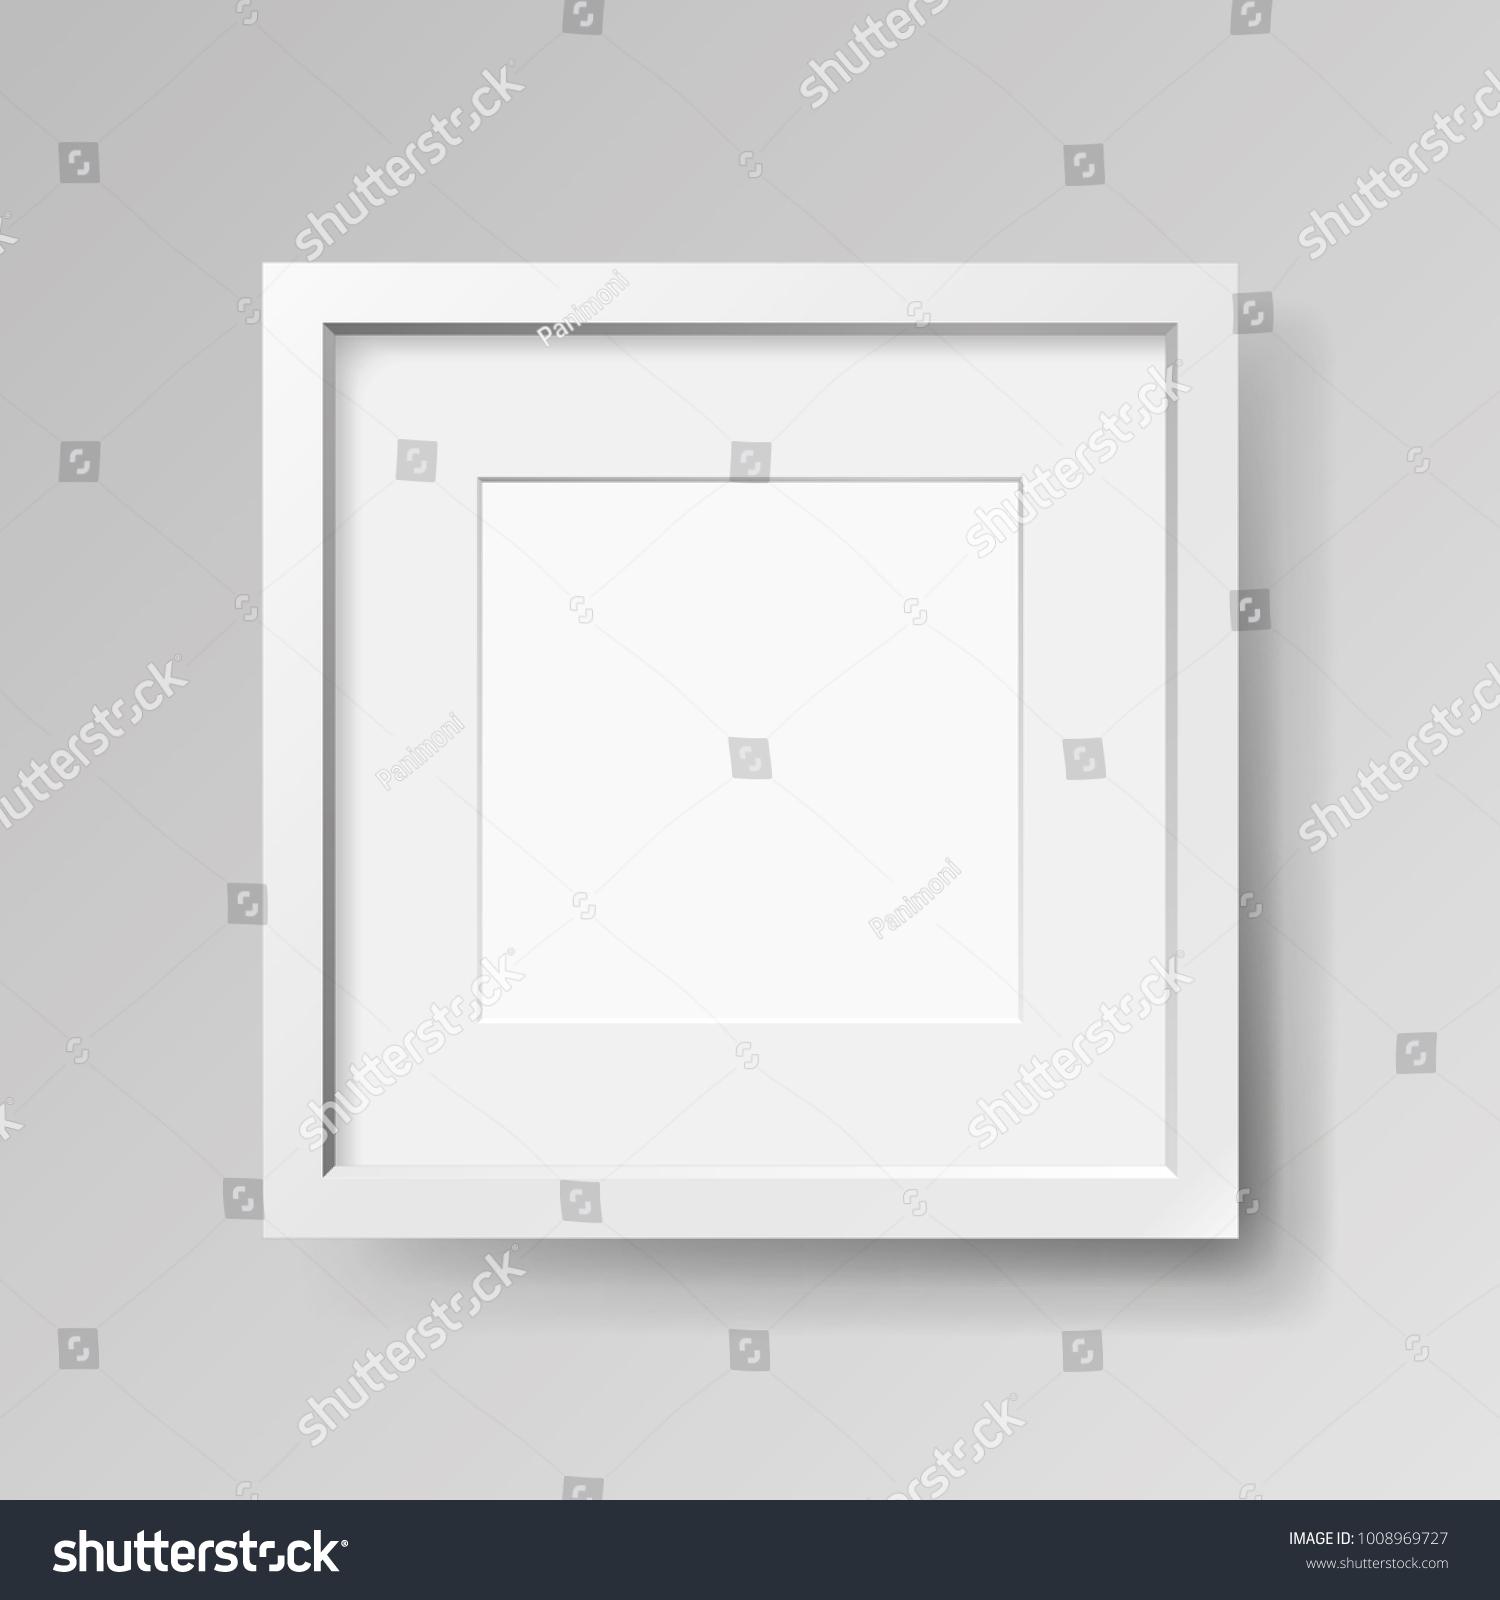 Realistic Empty White Frame Passepartout On Stock-Vektorgrafik ...